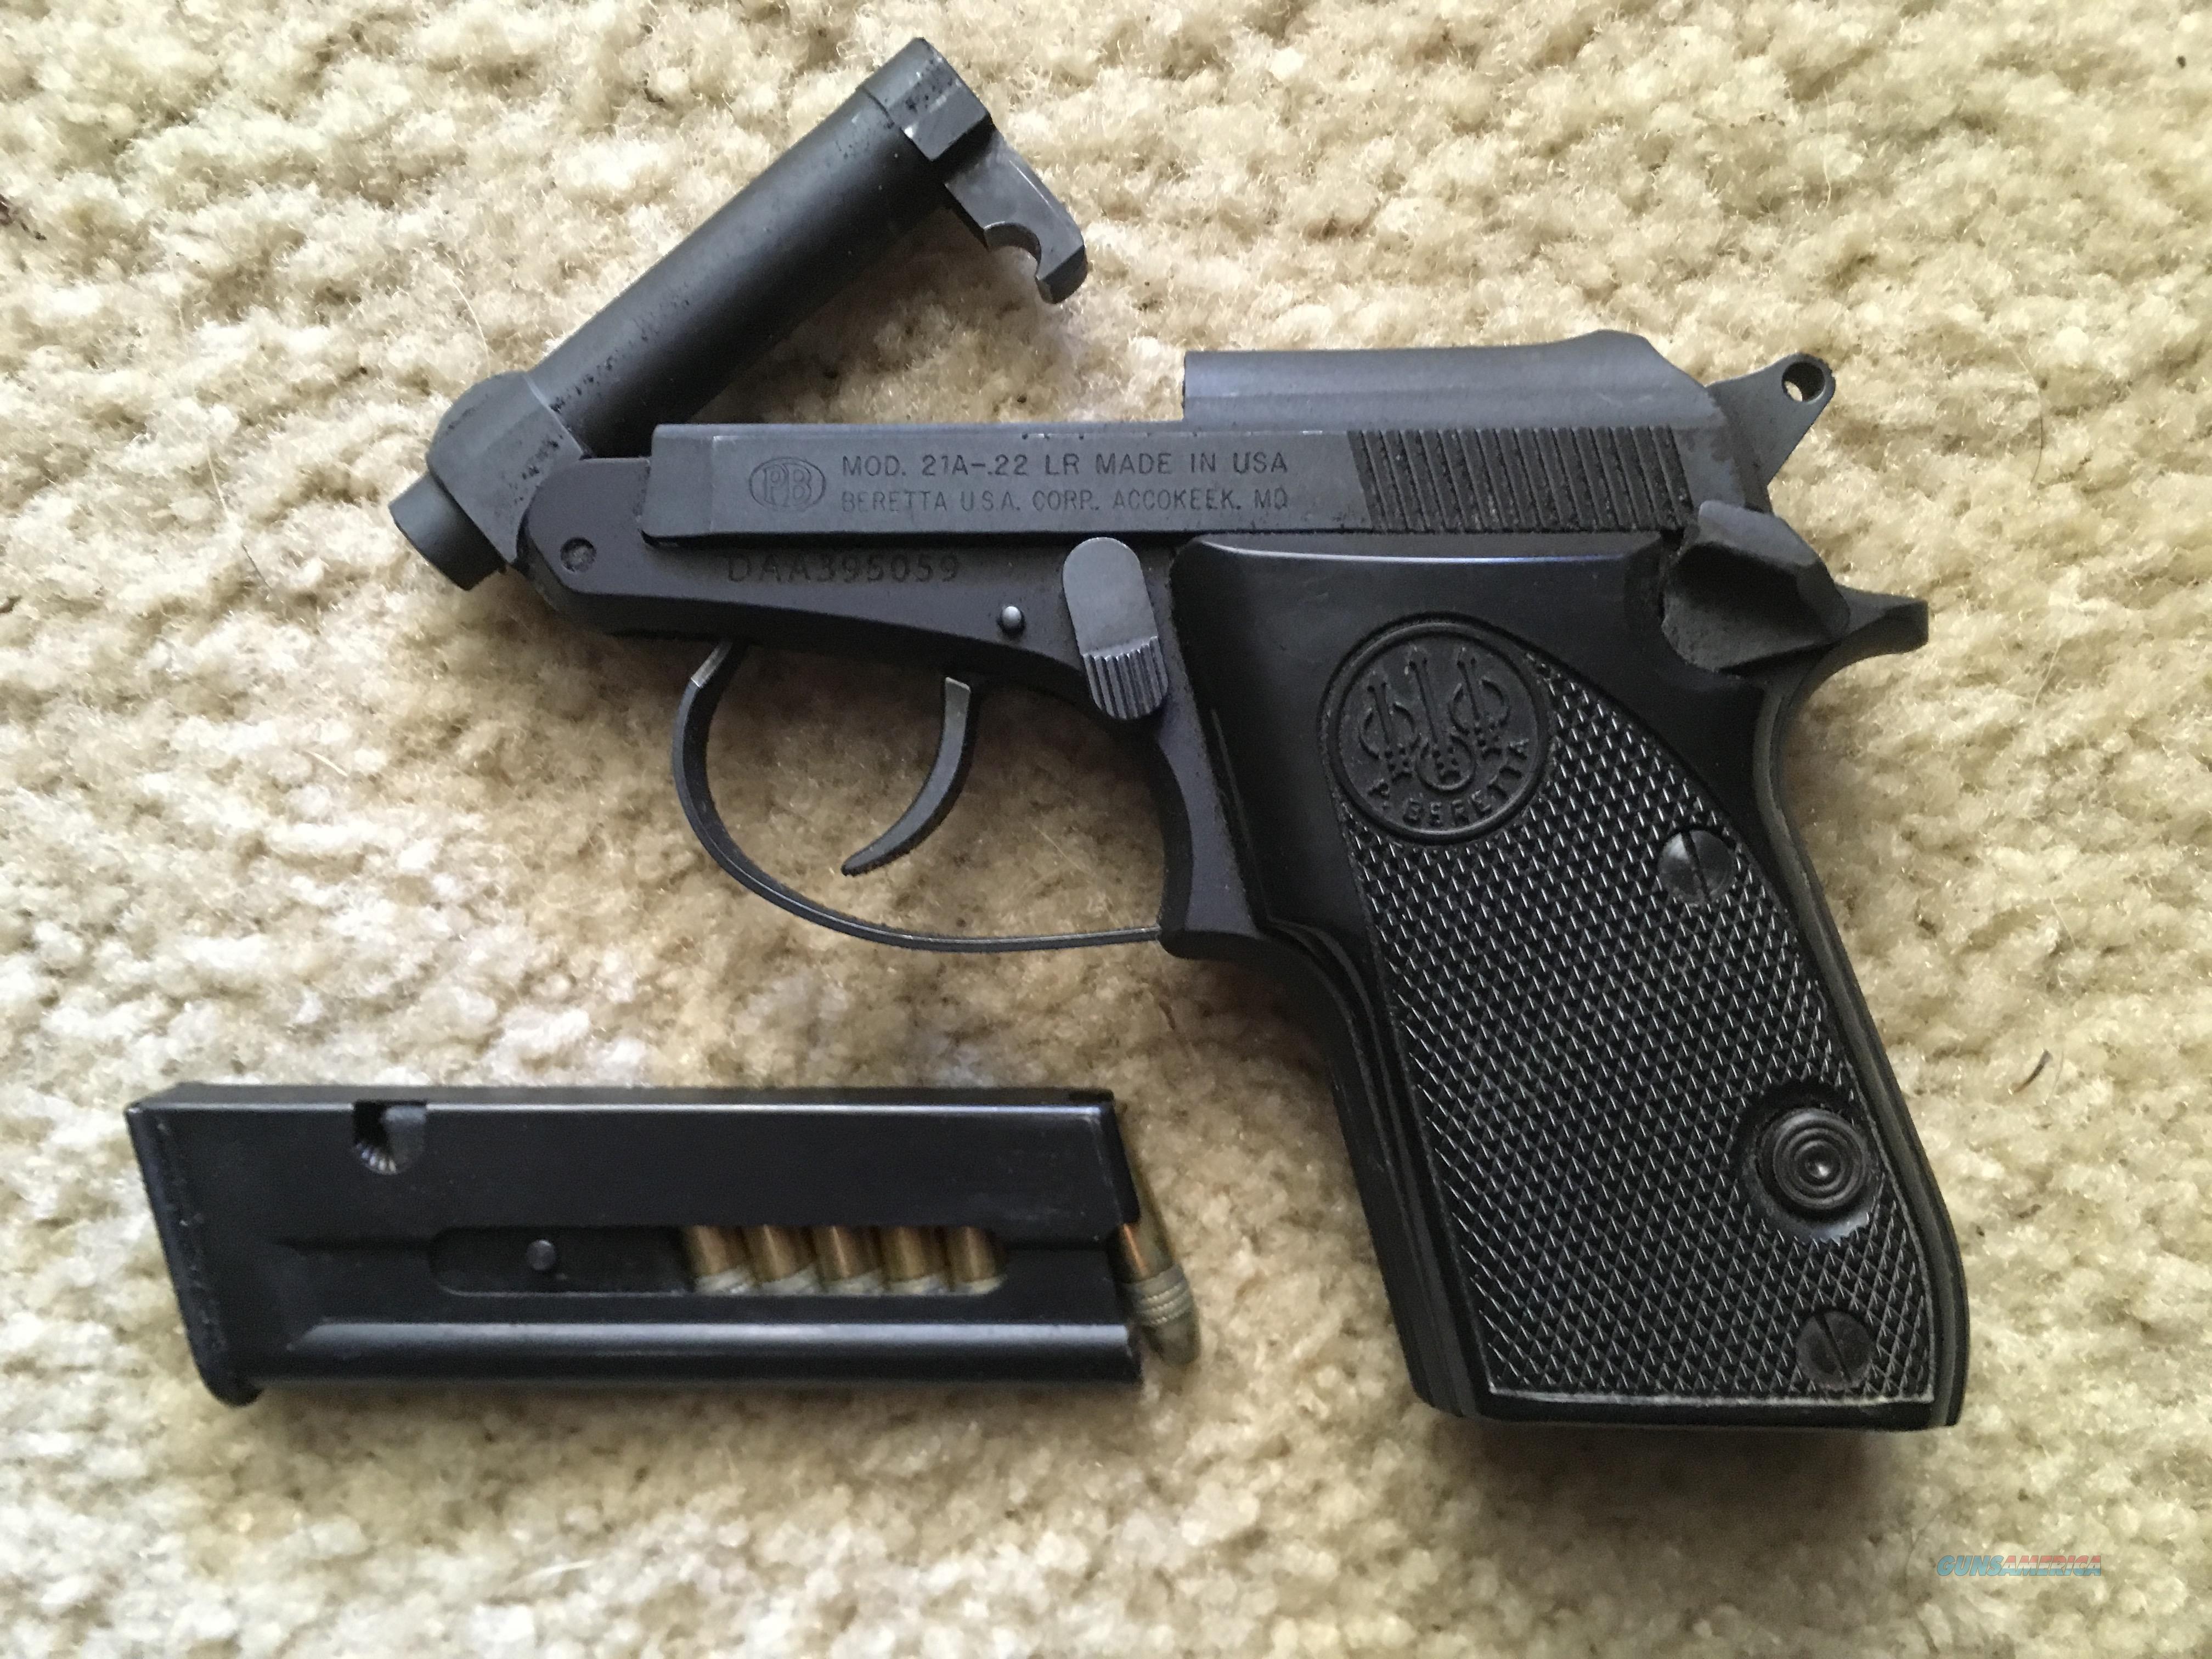 Beretta Bobcat Mod 21A -  LR  Guns > Pistols > Smith & Wesson Pistols - Autos > .22 Autos